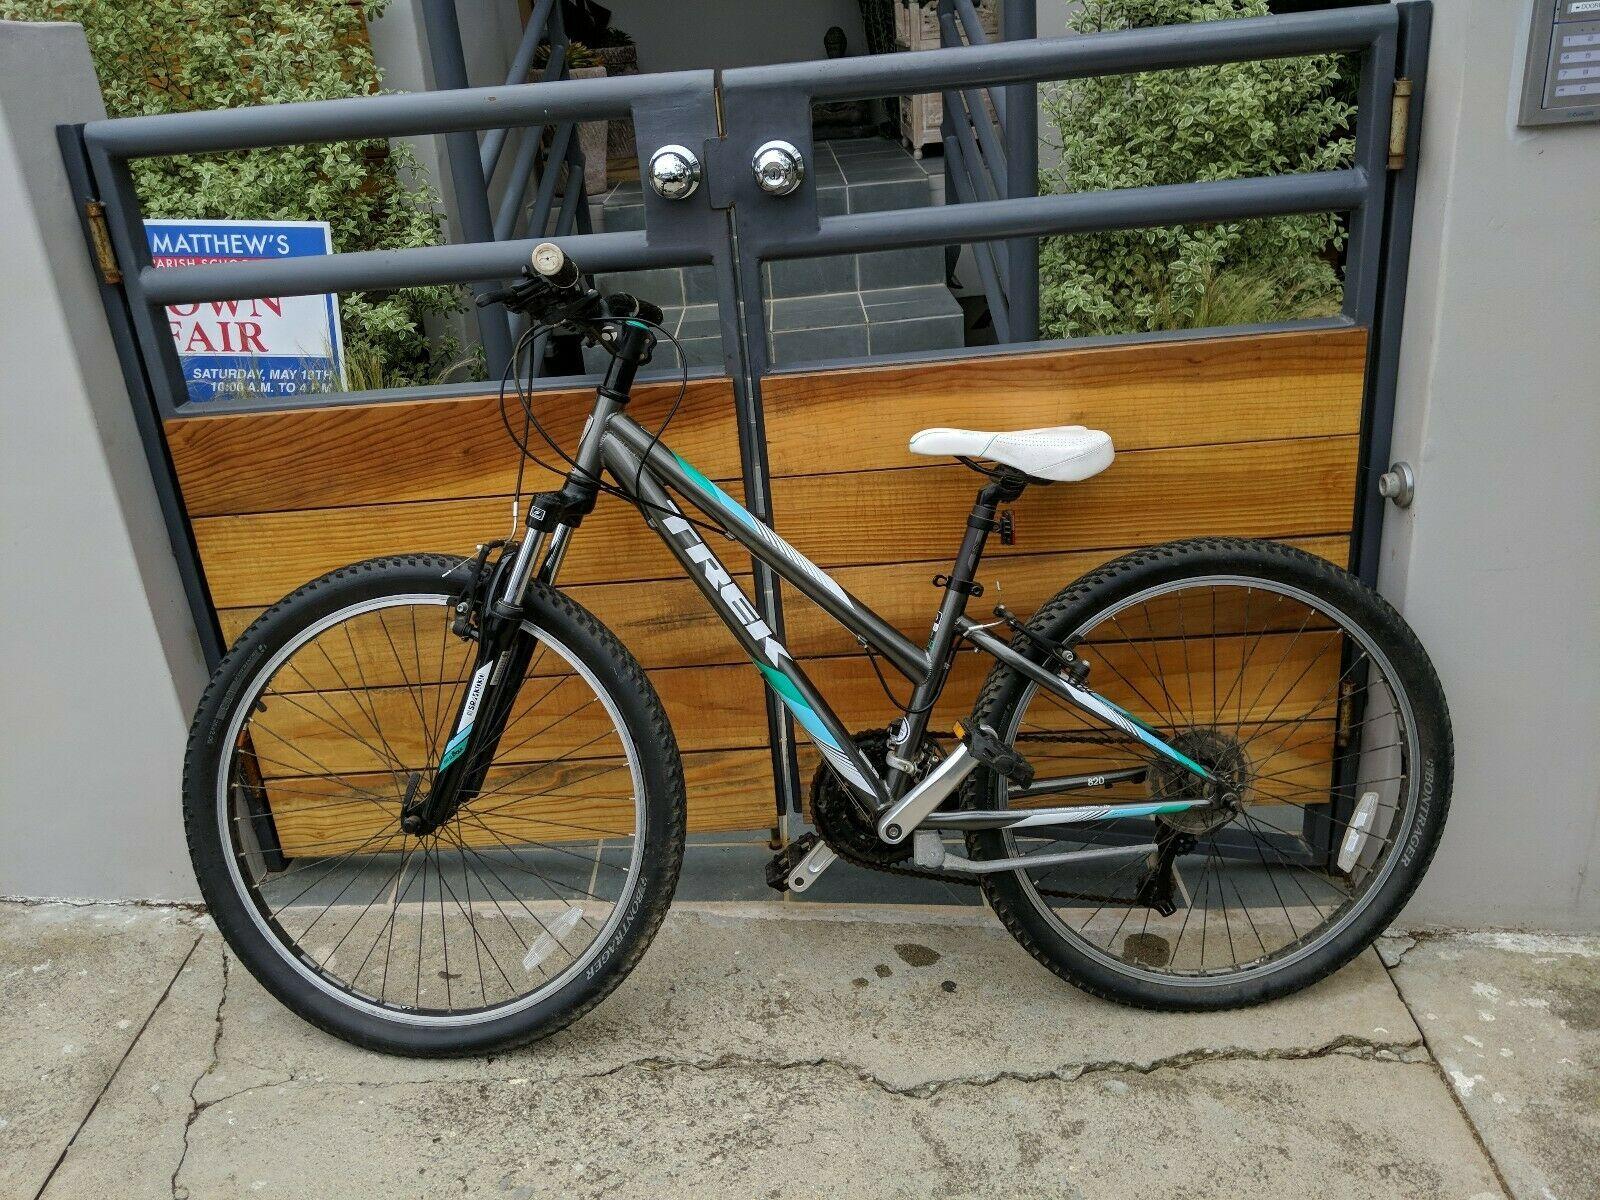 Trek 820 Mountain Bike 33cm 13 Mountain Bike Ideas Of Mountain Bike Mountainbi Cannondale Mountain Bikes Carbon Fiber Mountain Bike Folding Mountain Bike